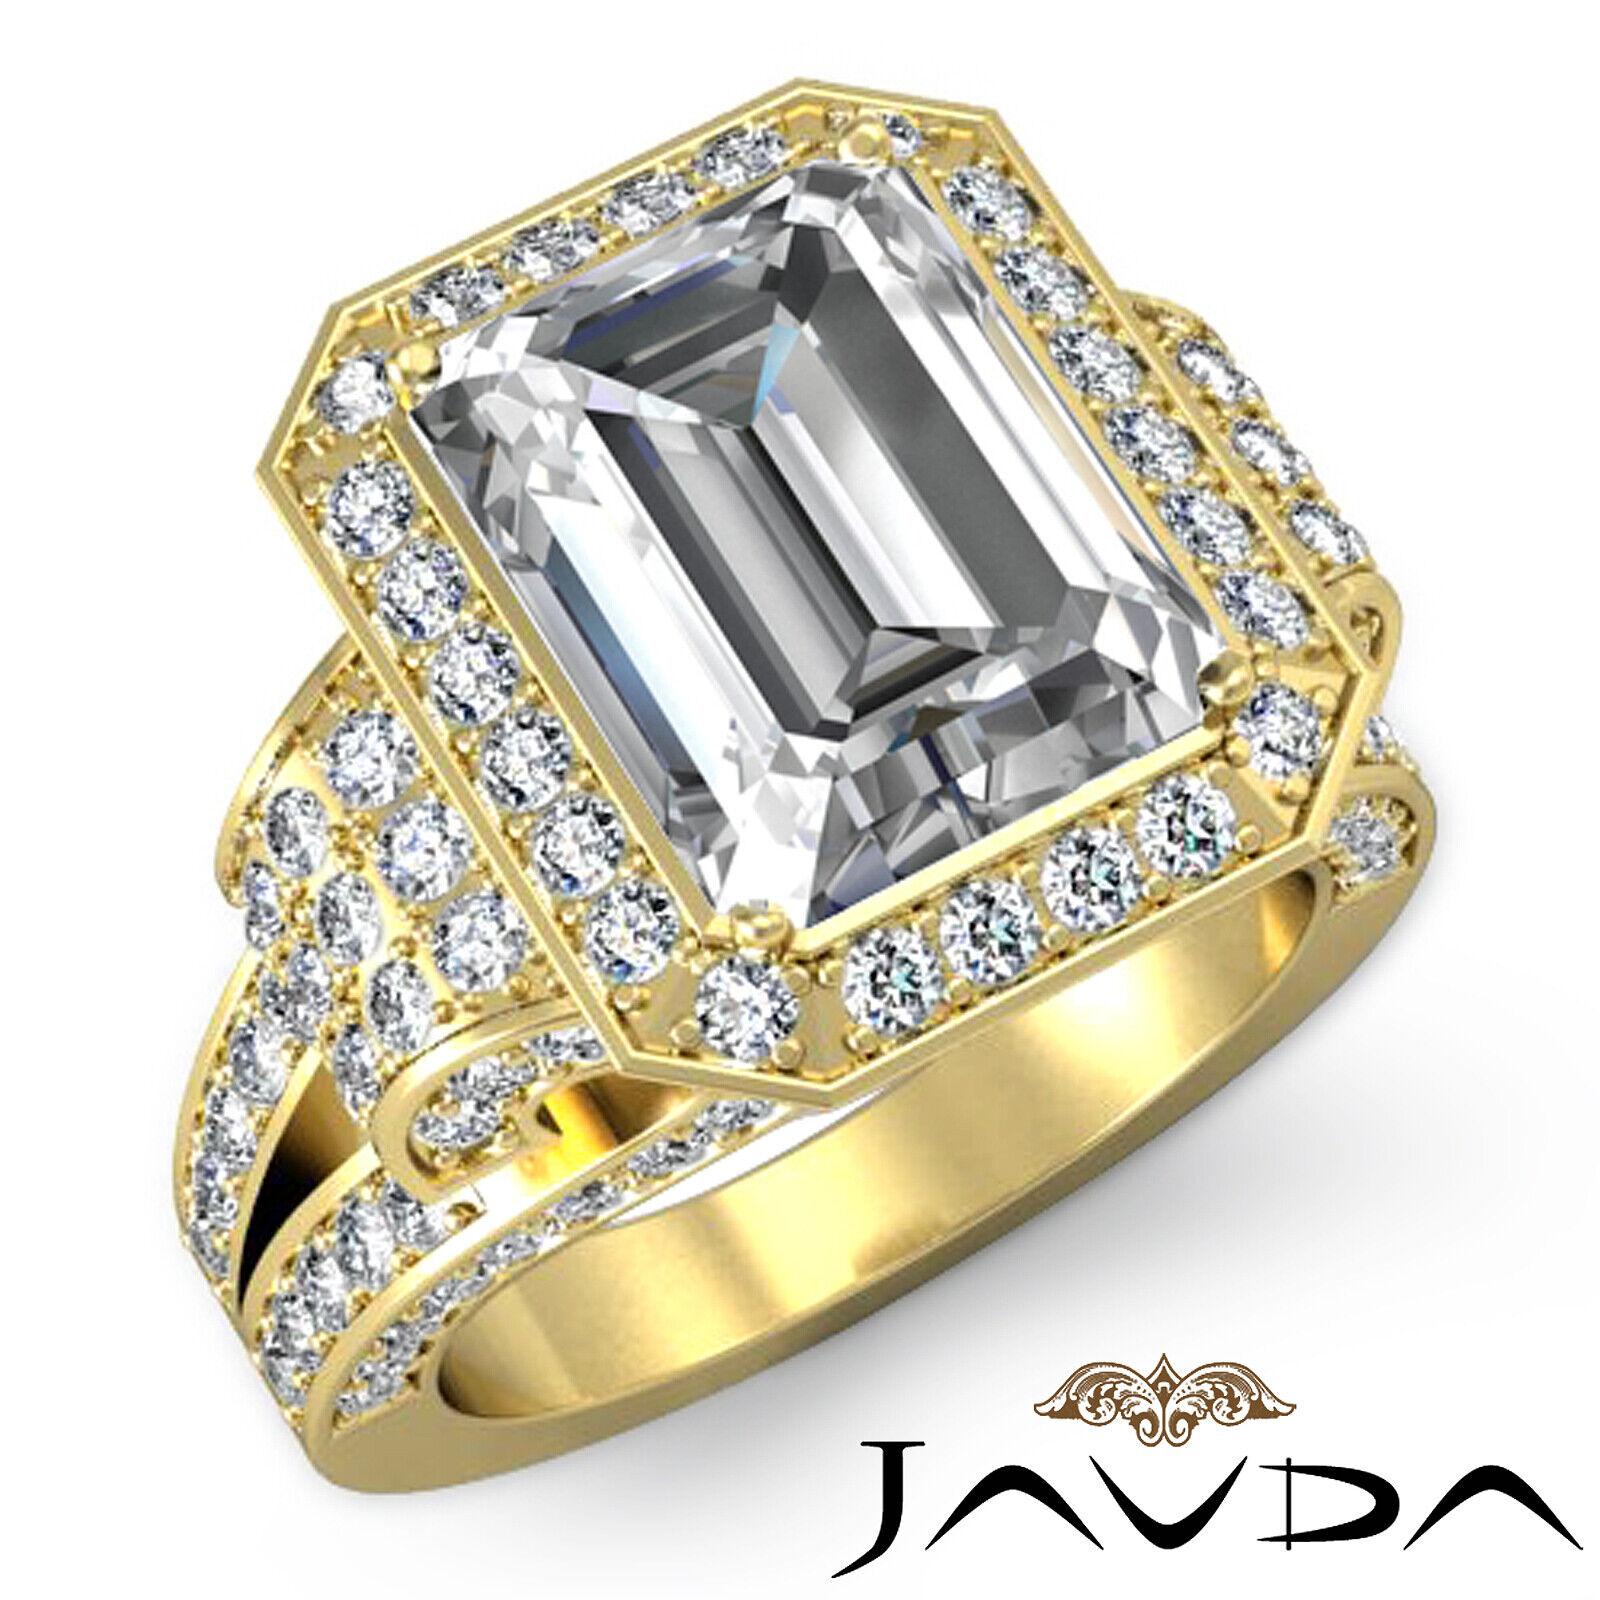 4.4ctw Antique Vintage Halo Emerald Diamond Engagement Ring GIA I-VS1 White Gold 7